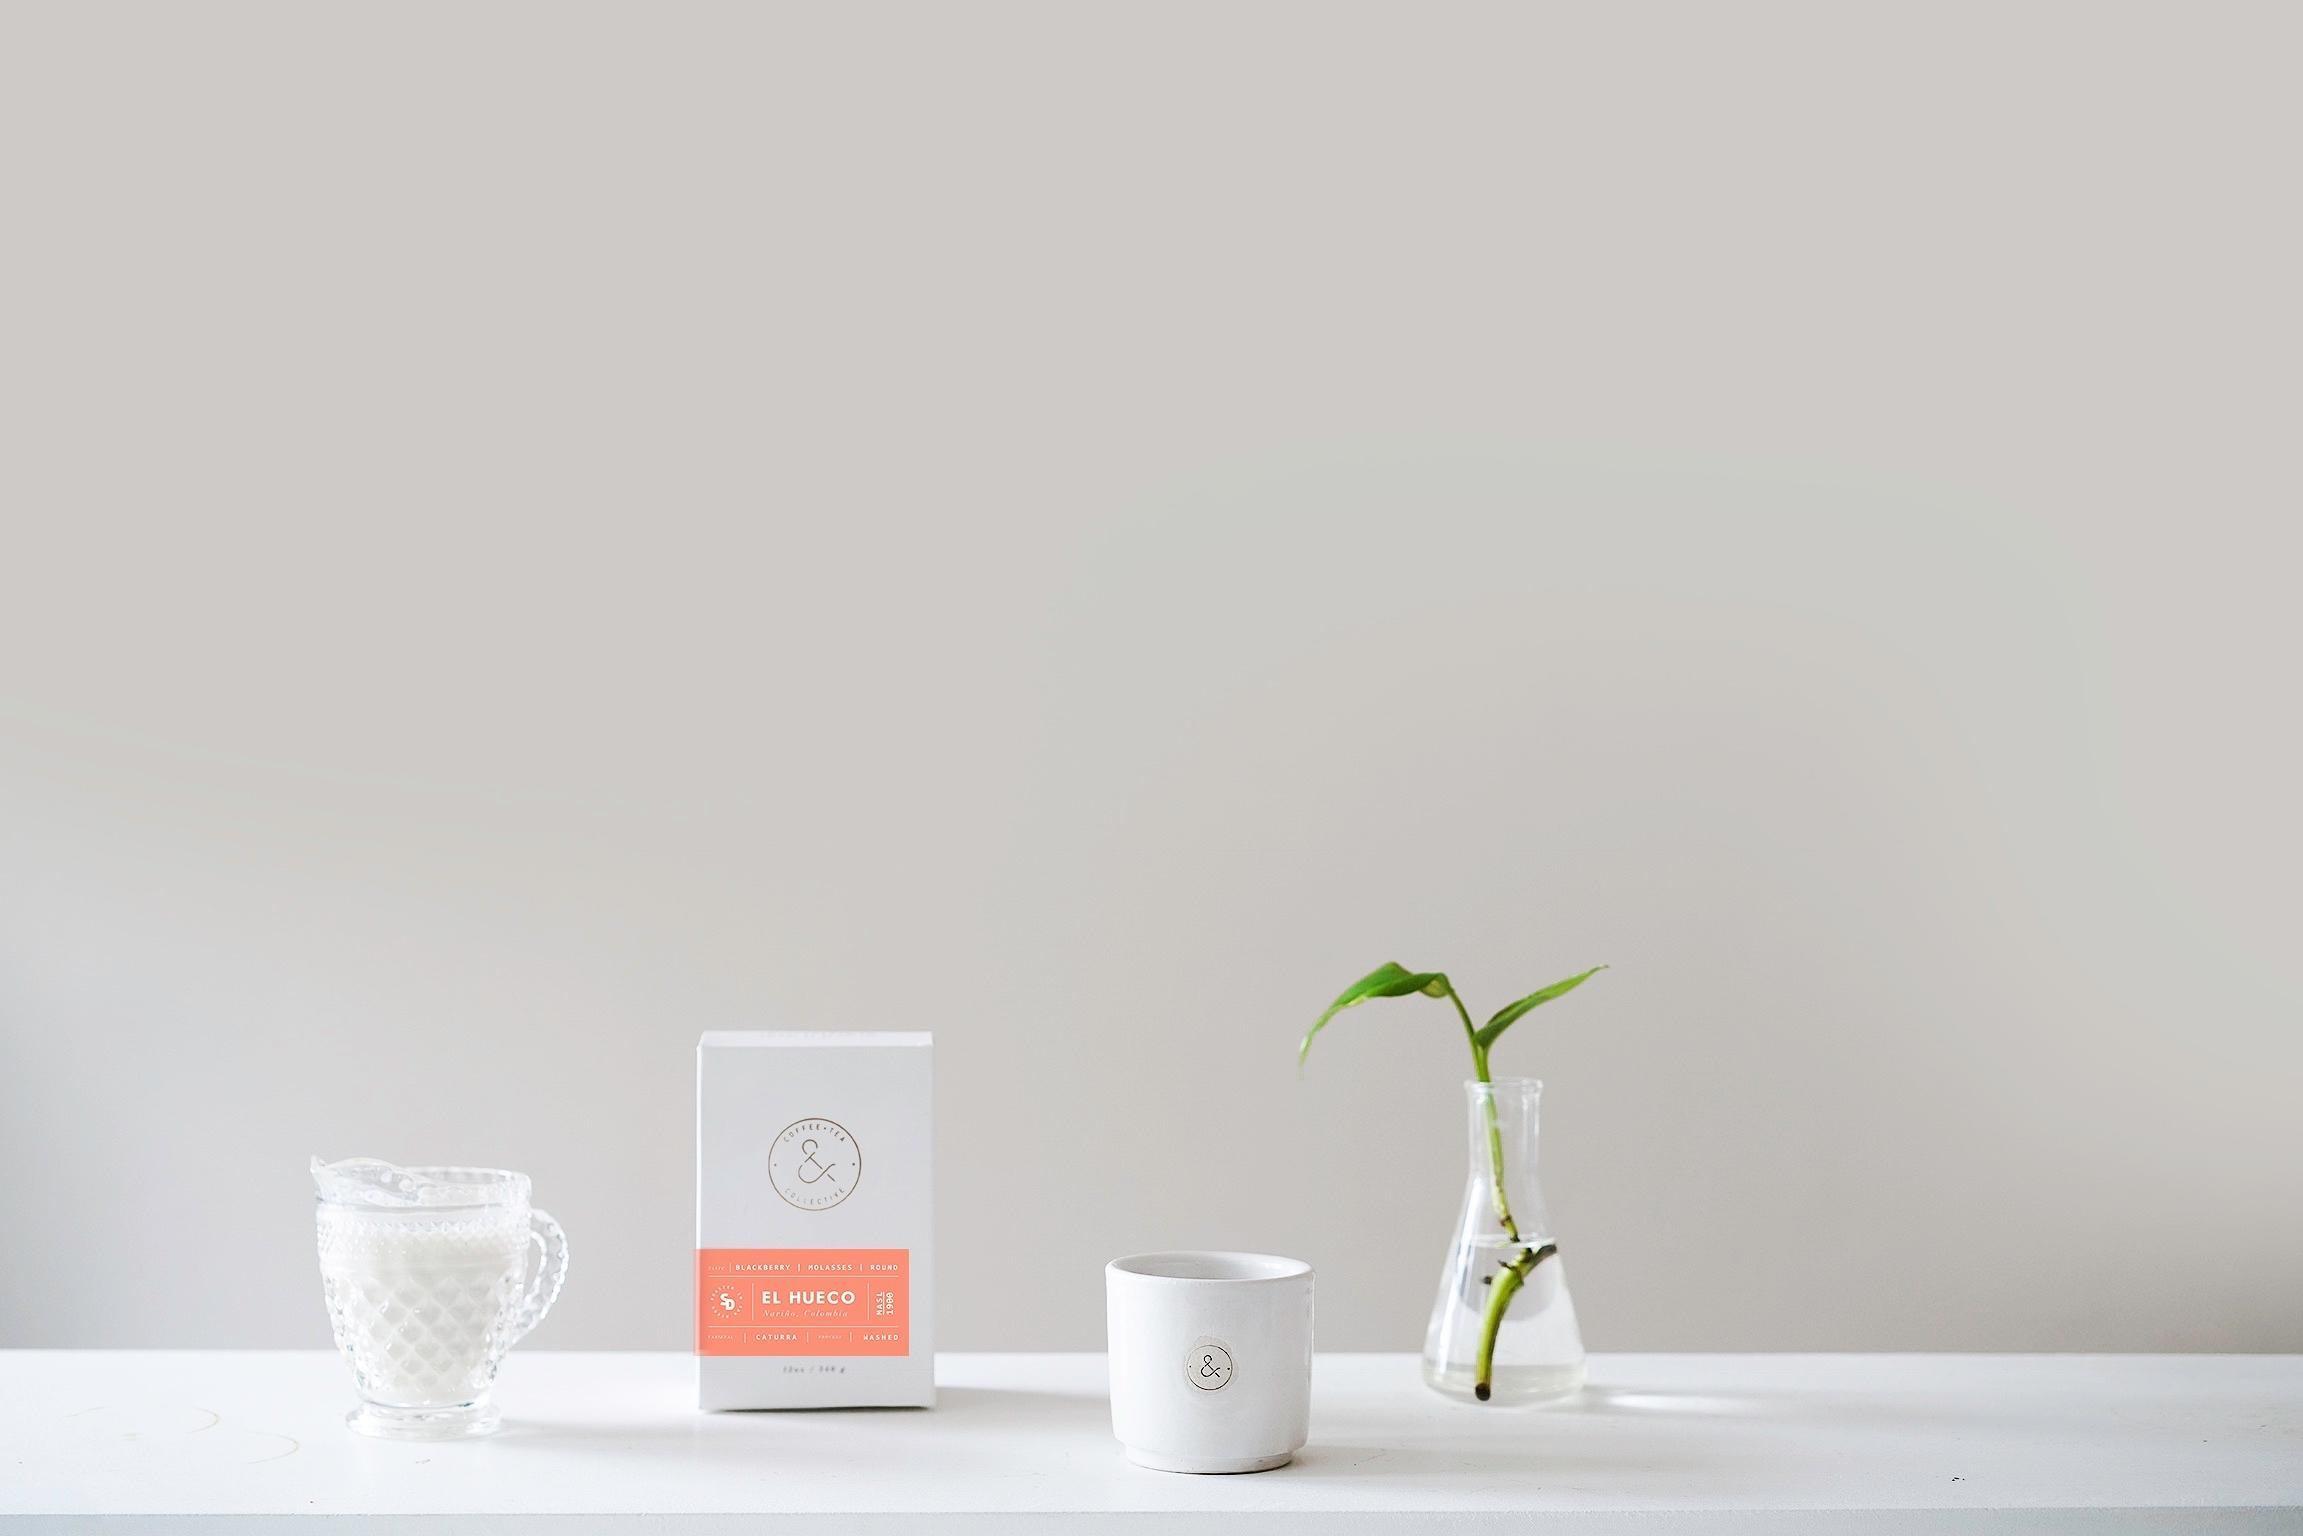 San Diego Packaging Design Coffee Box